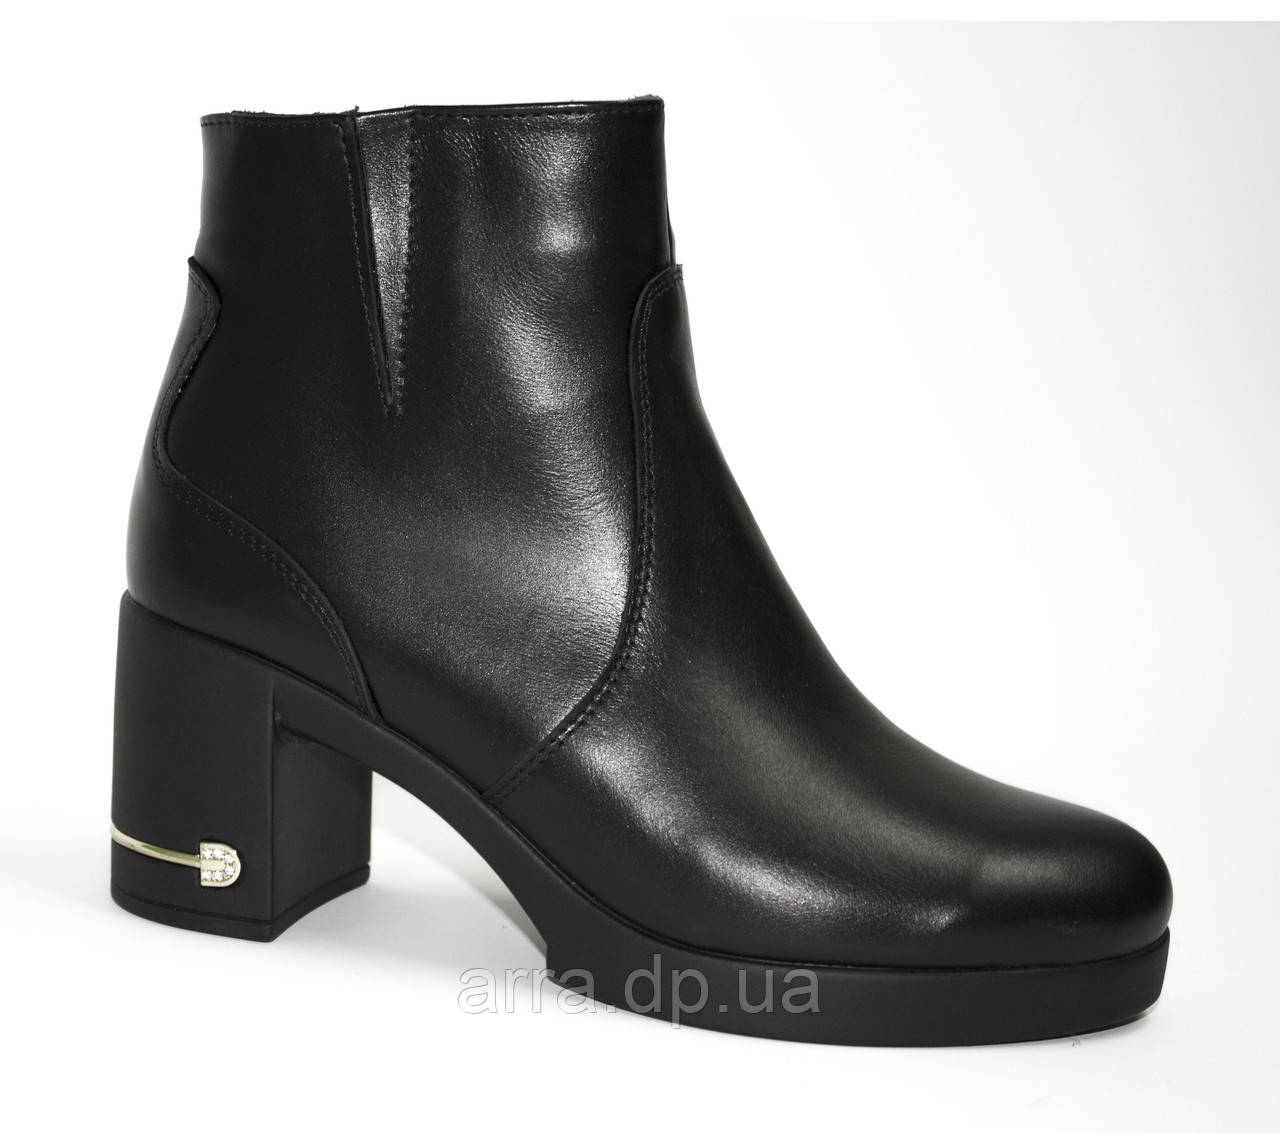 Короткие ботиночки на каблучке